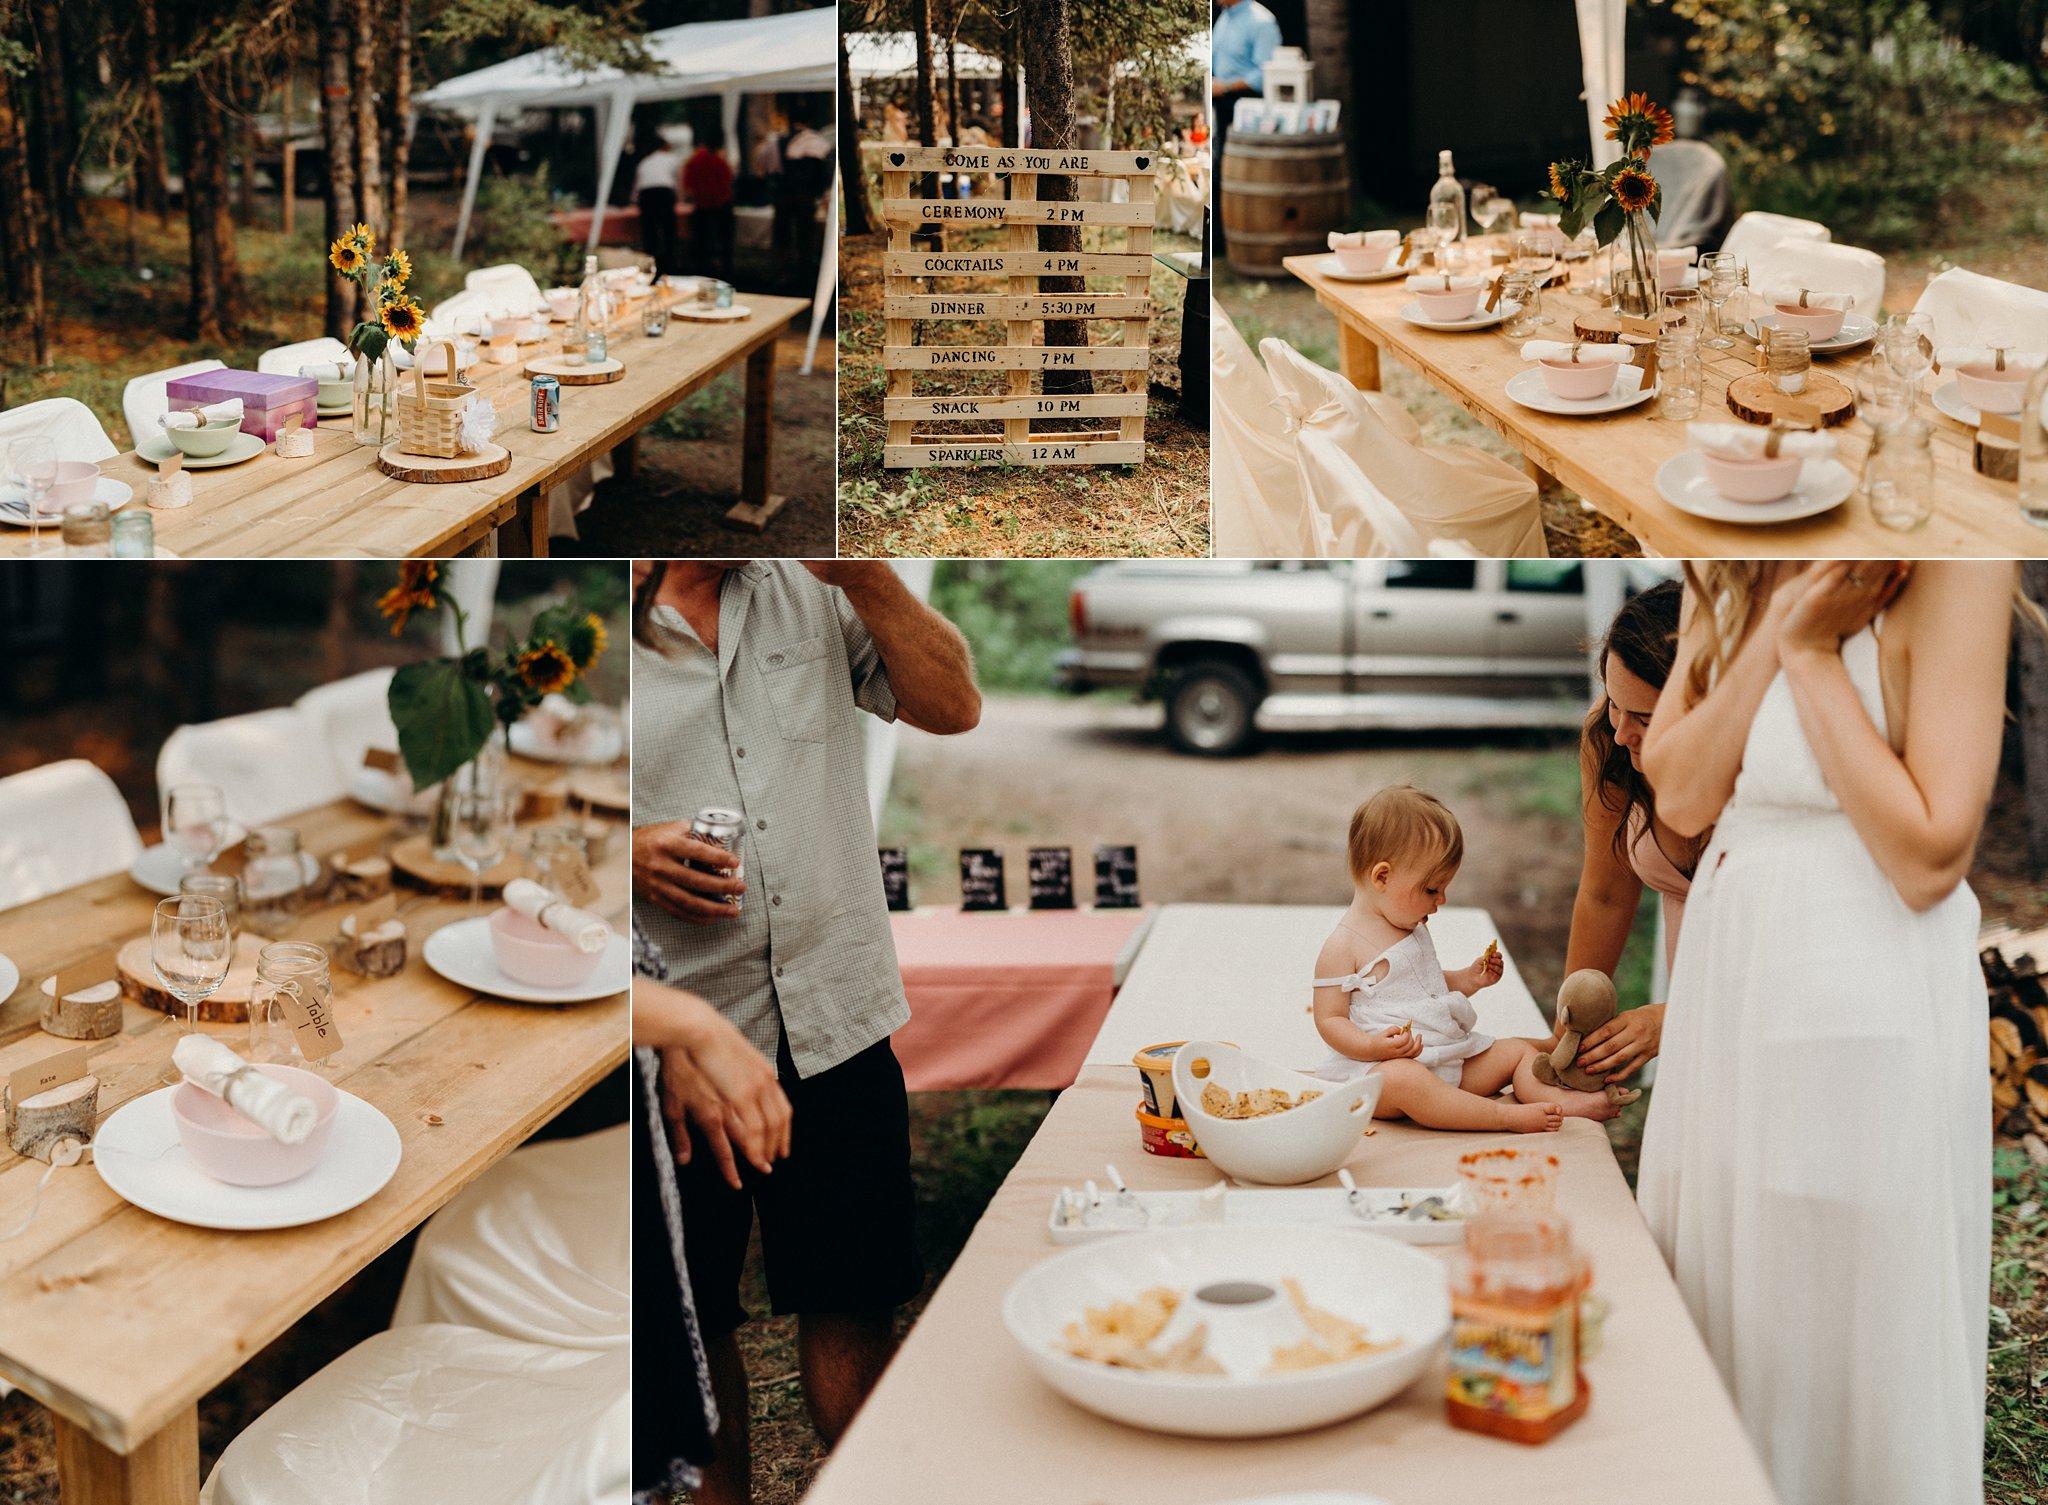 kaihla_tonai_intimate_wedding_elopement_photographer_6414.jpg